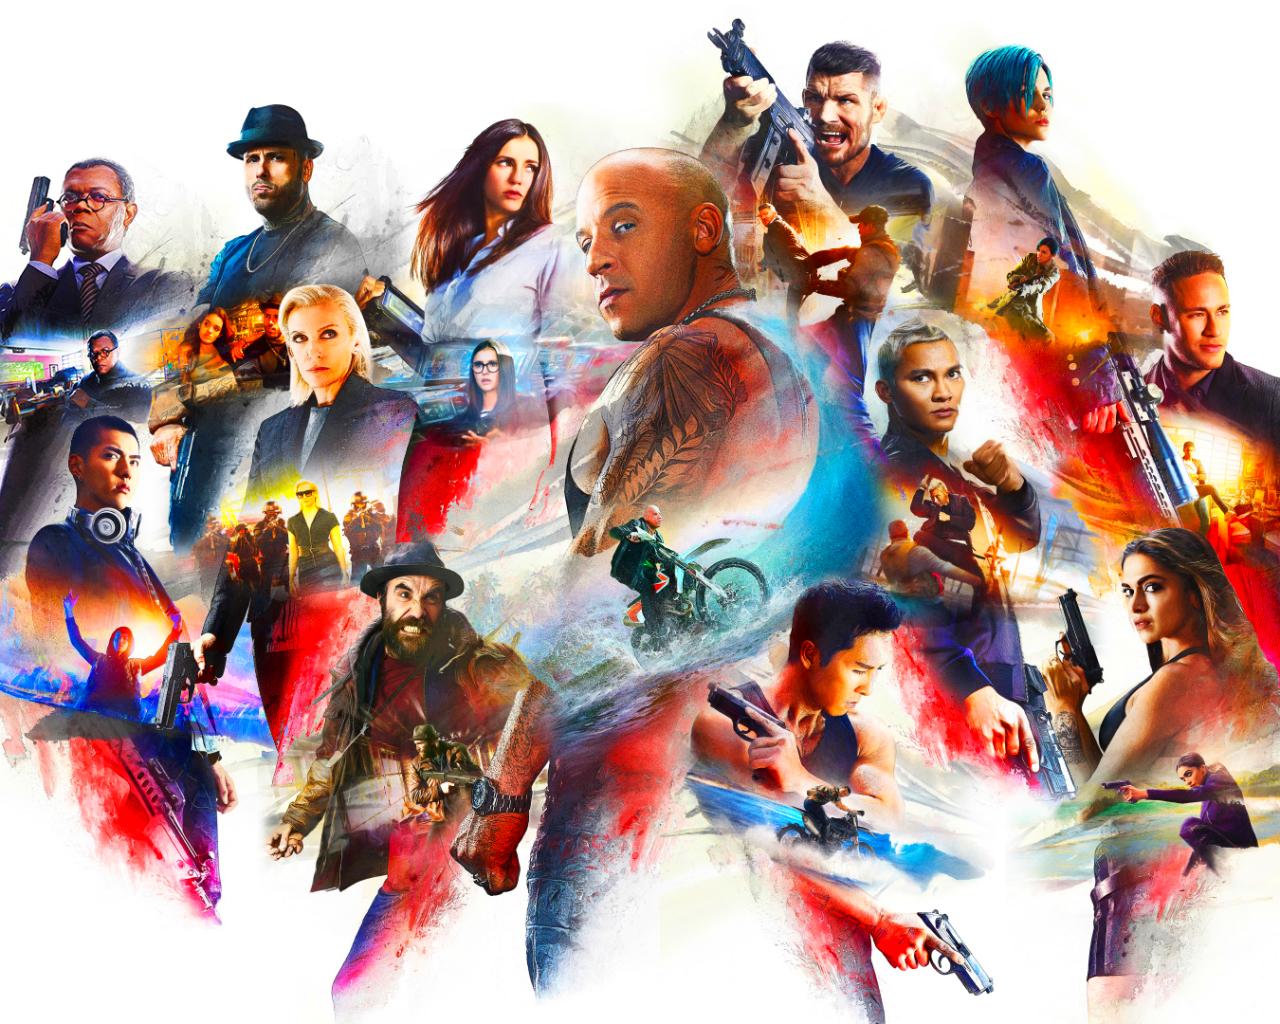 Xxx Return Of Xander Cage 2017 Action Films Wallpaper 41268746 Fanpop